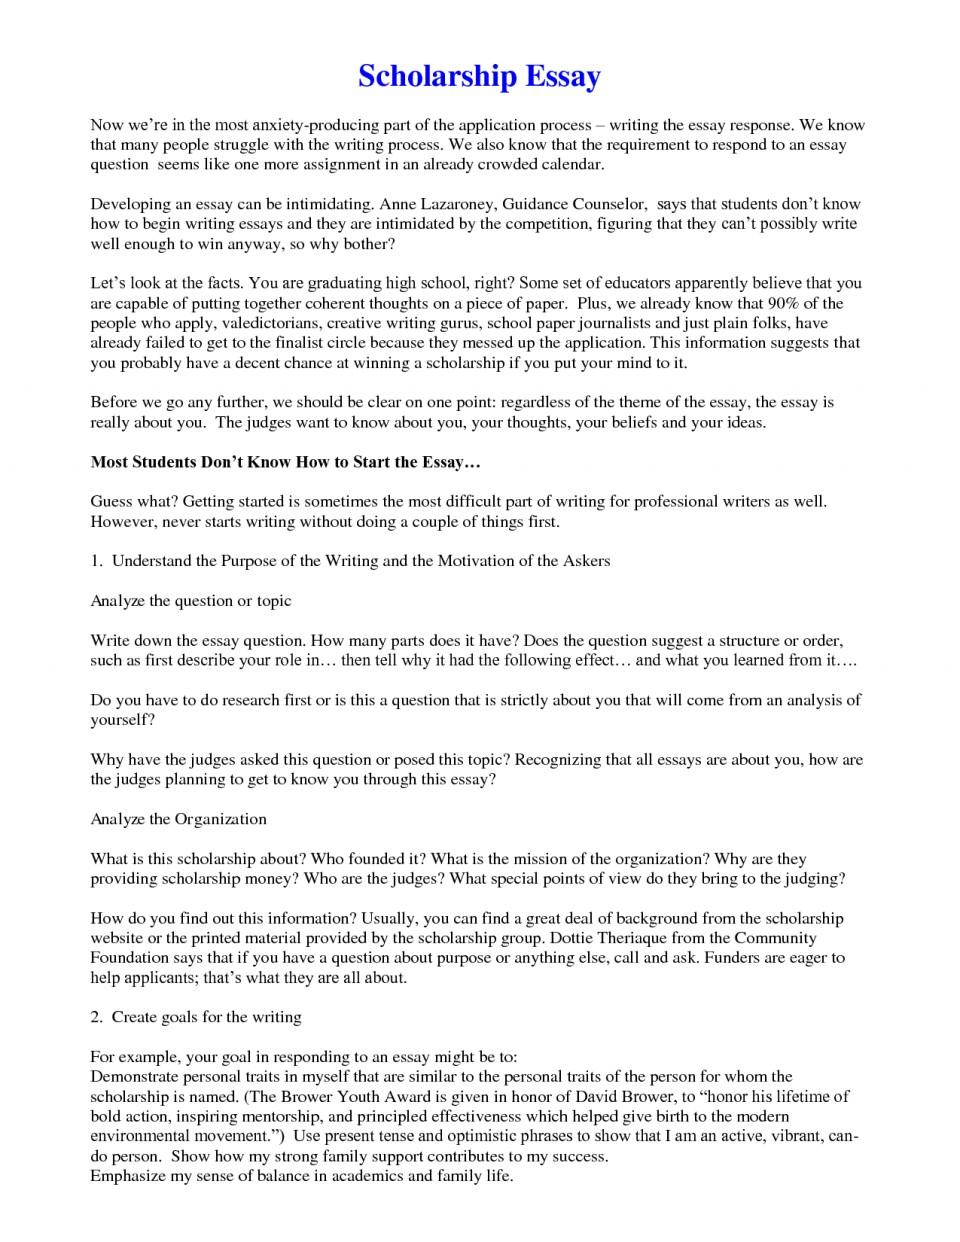 Formal outline format for an essay